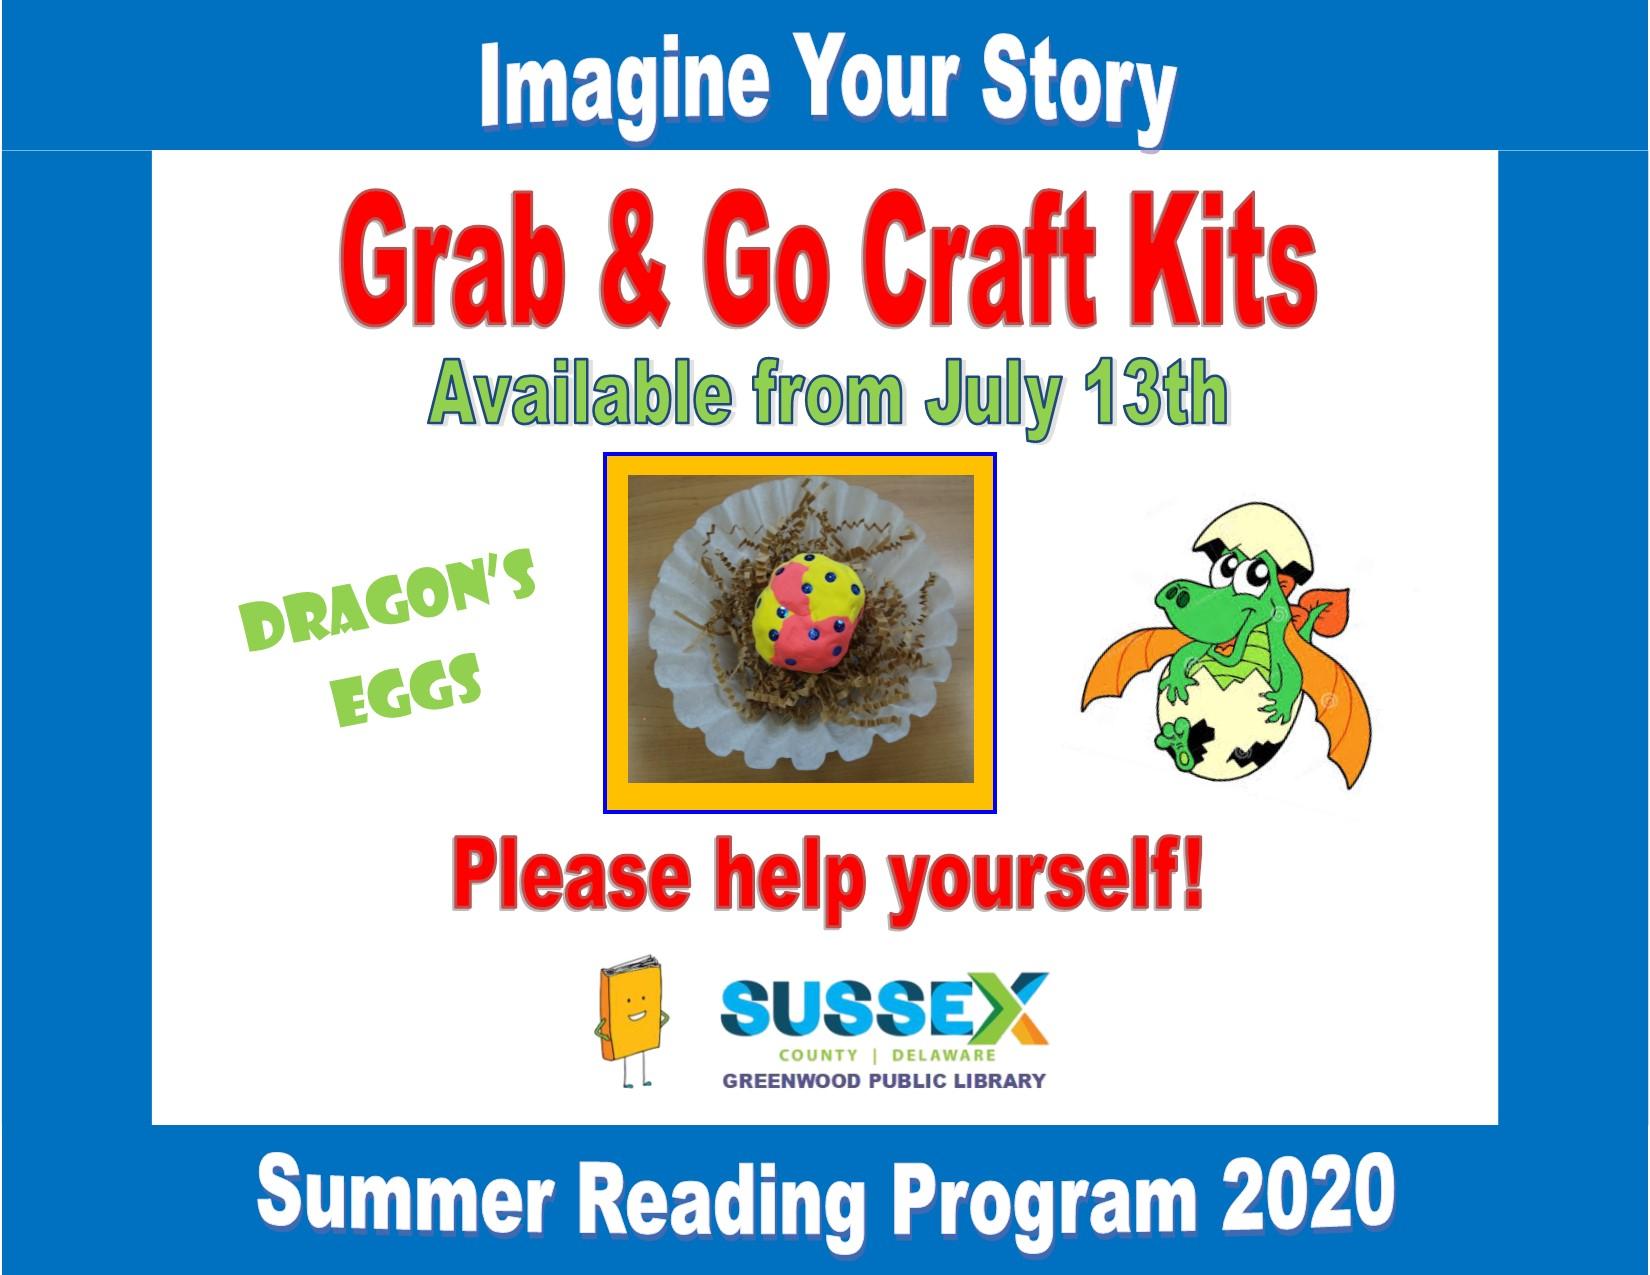 Grab & Go Craft Kits: Dragon's Eggs